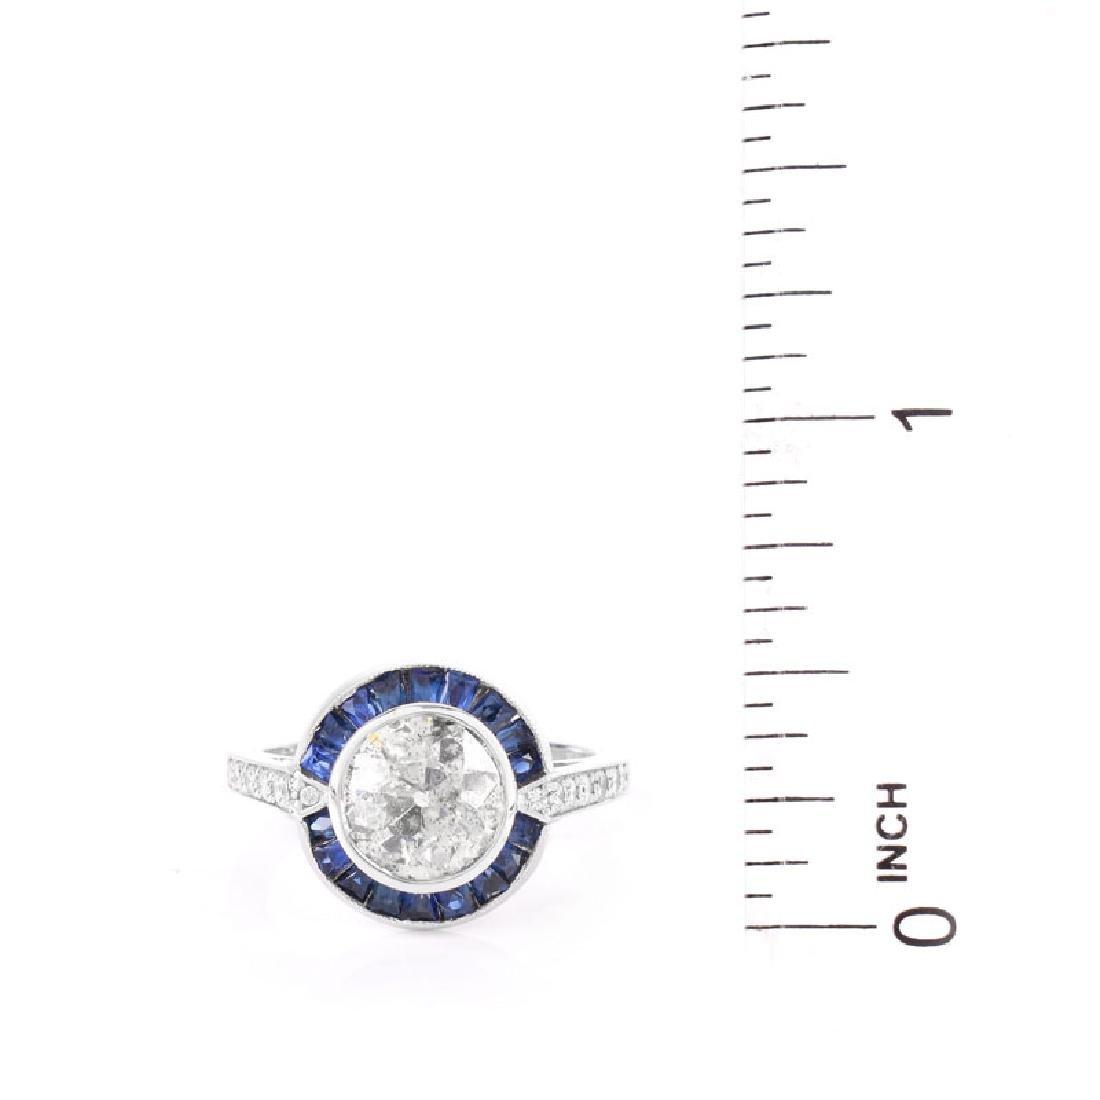 Vintage Approx. 2.0 Carat Old European Cut Diamond, - 6